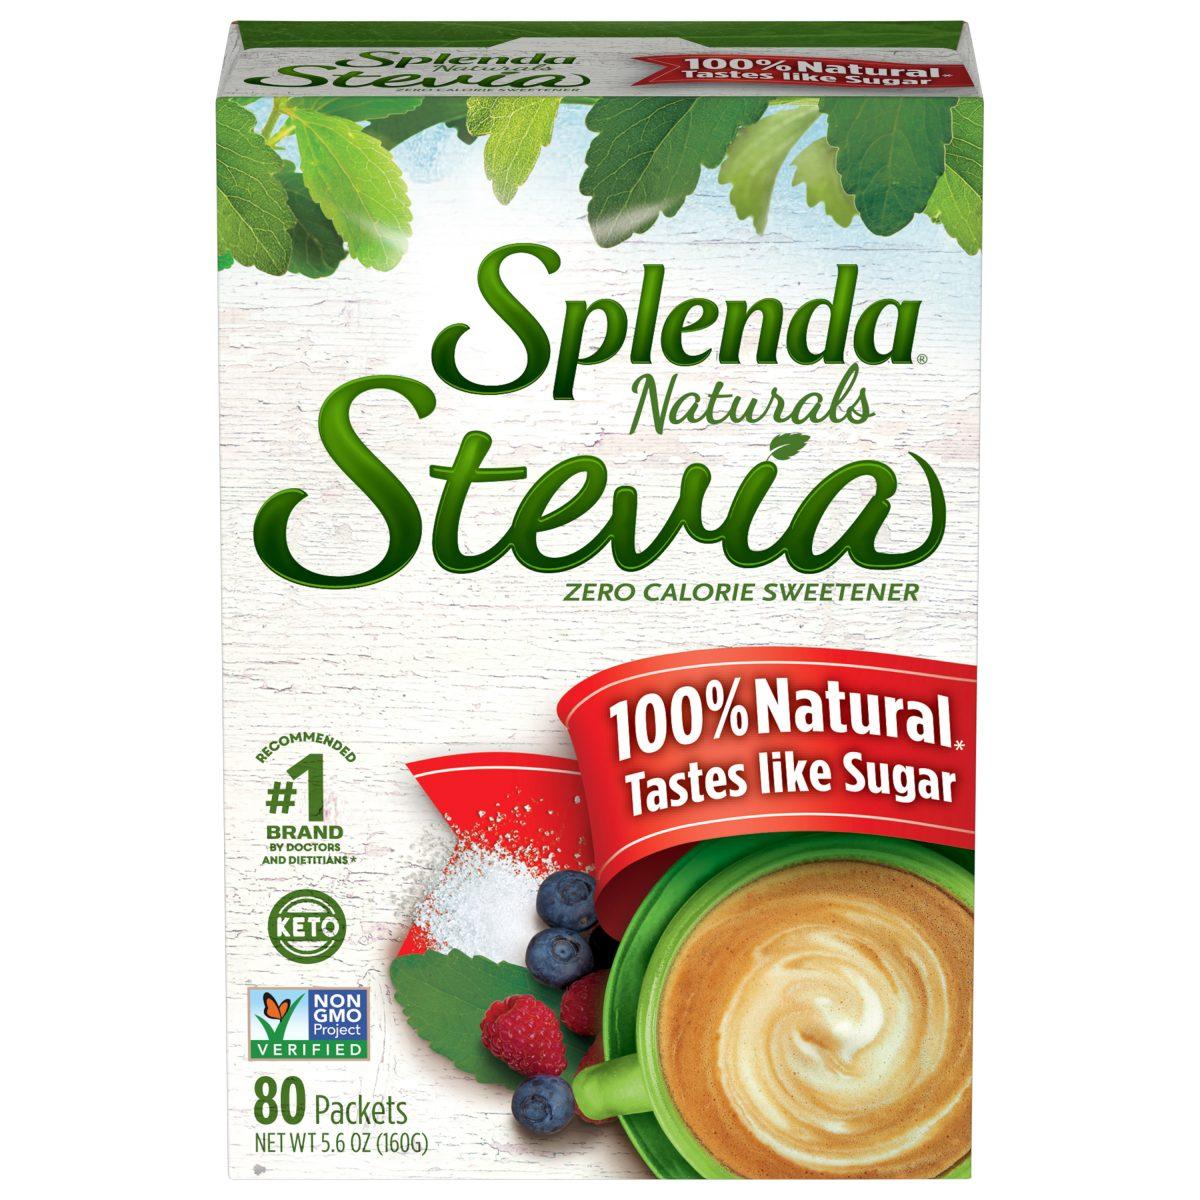 Splenda Stevia Sweeteners